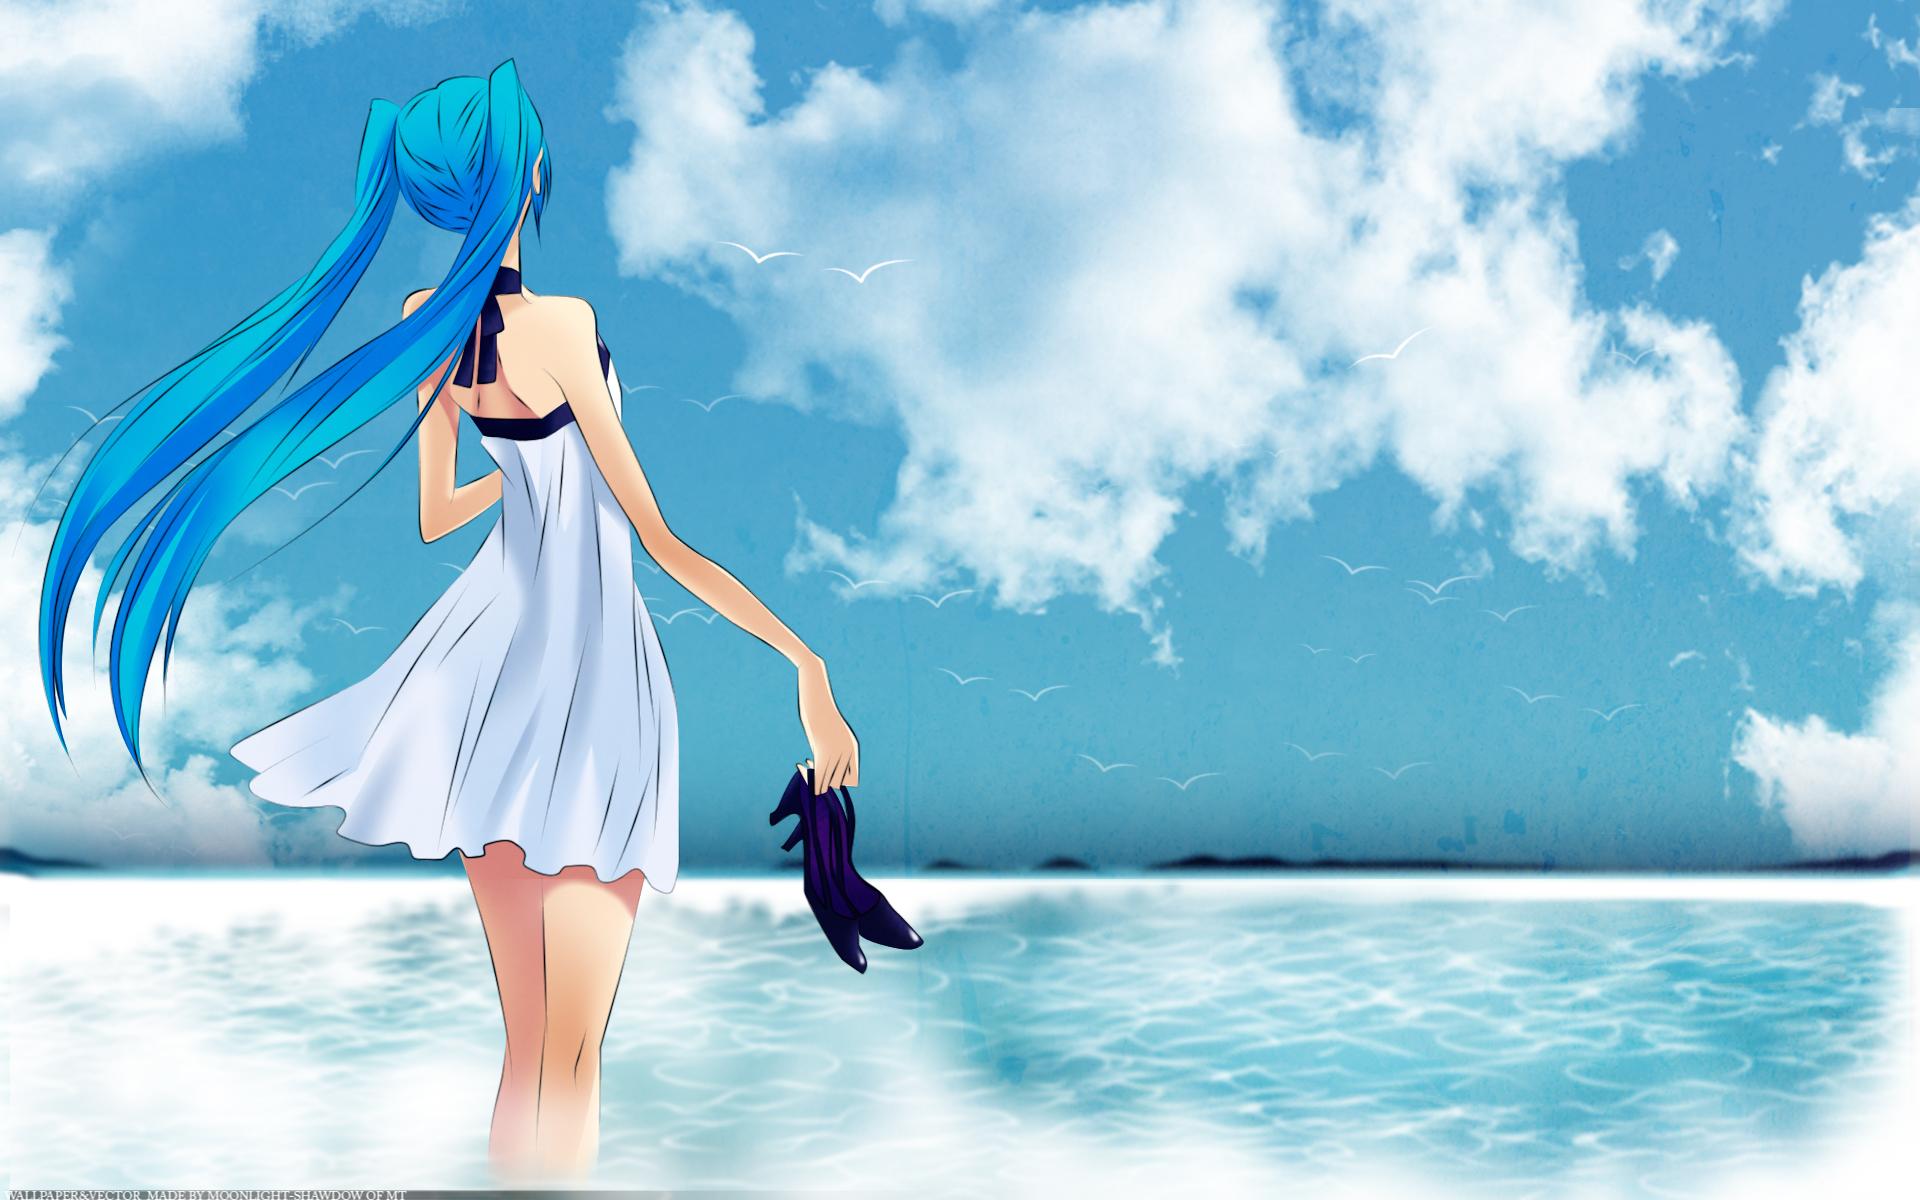 Summer time image anime fans of moddb mod db - Beach anime girl ...